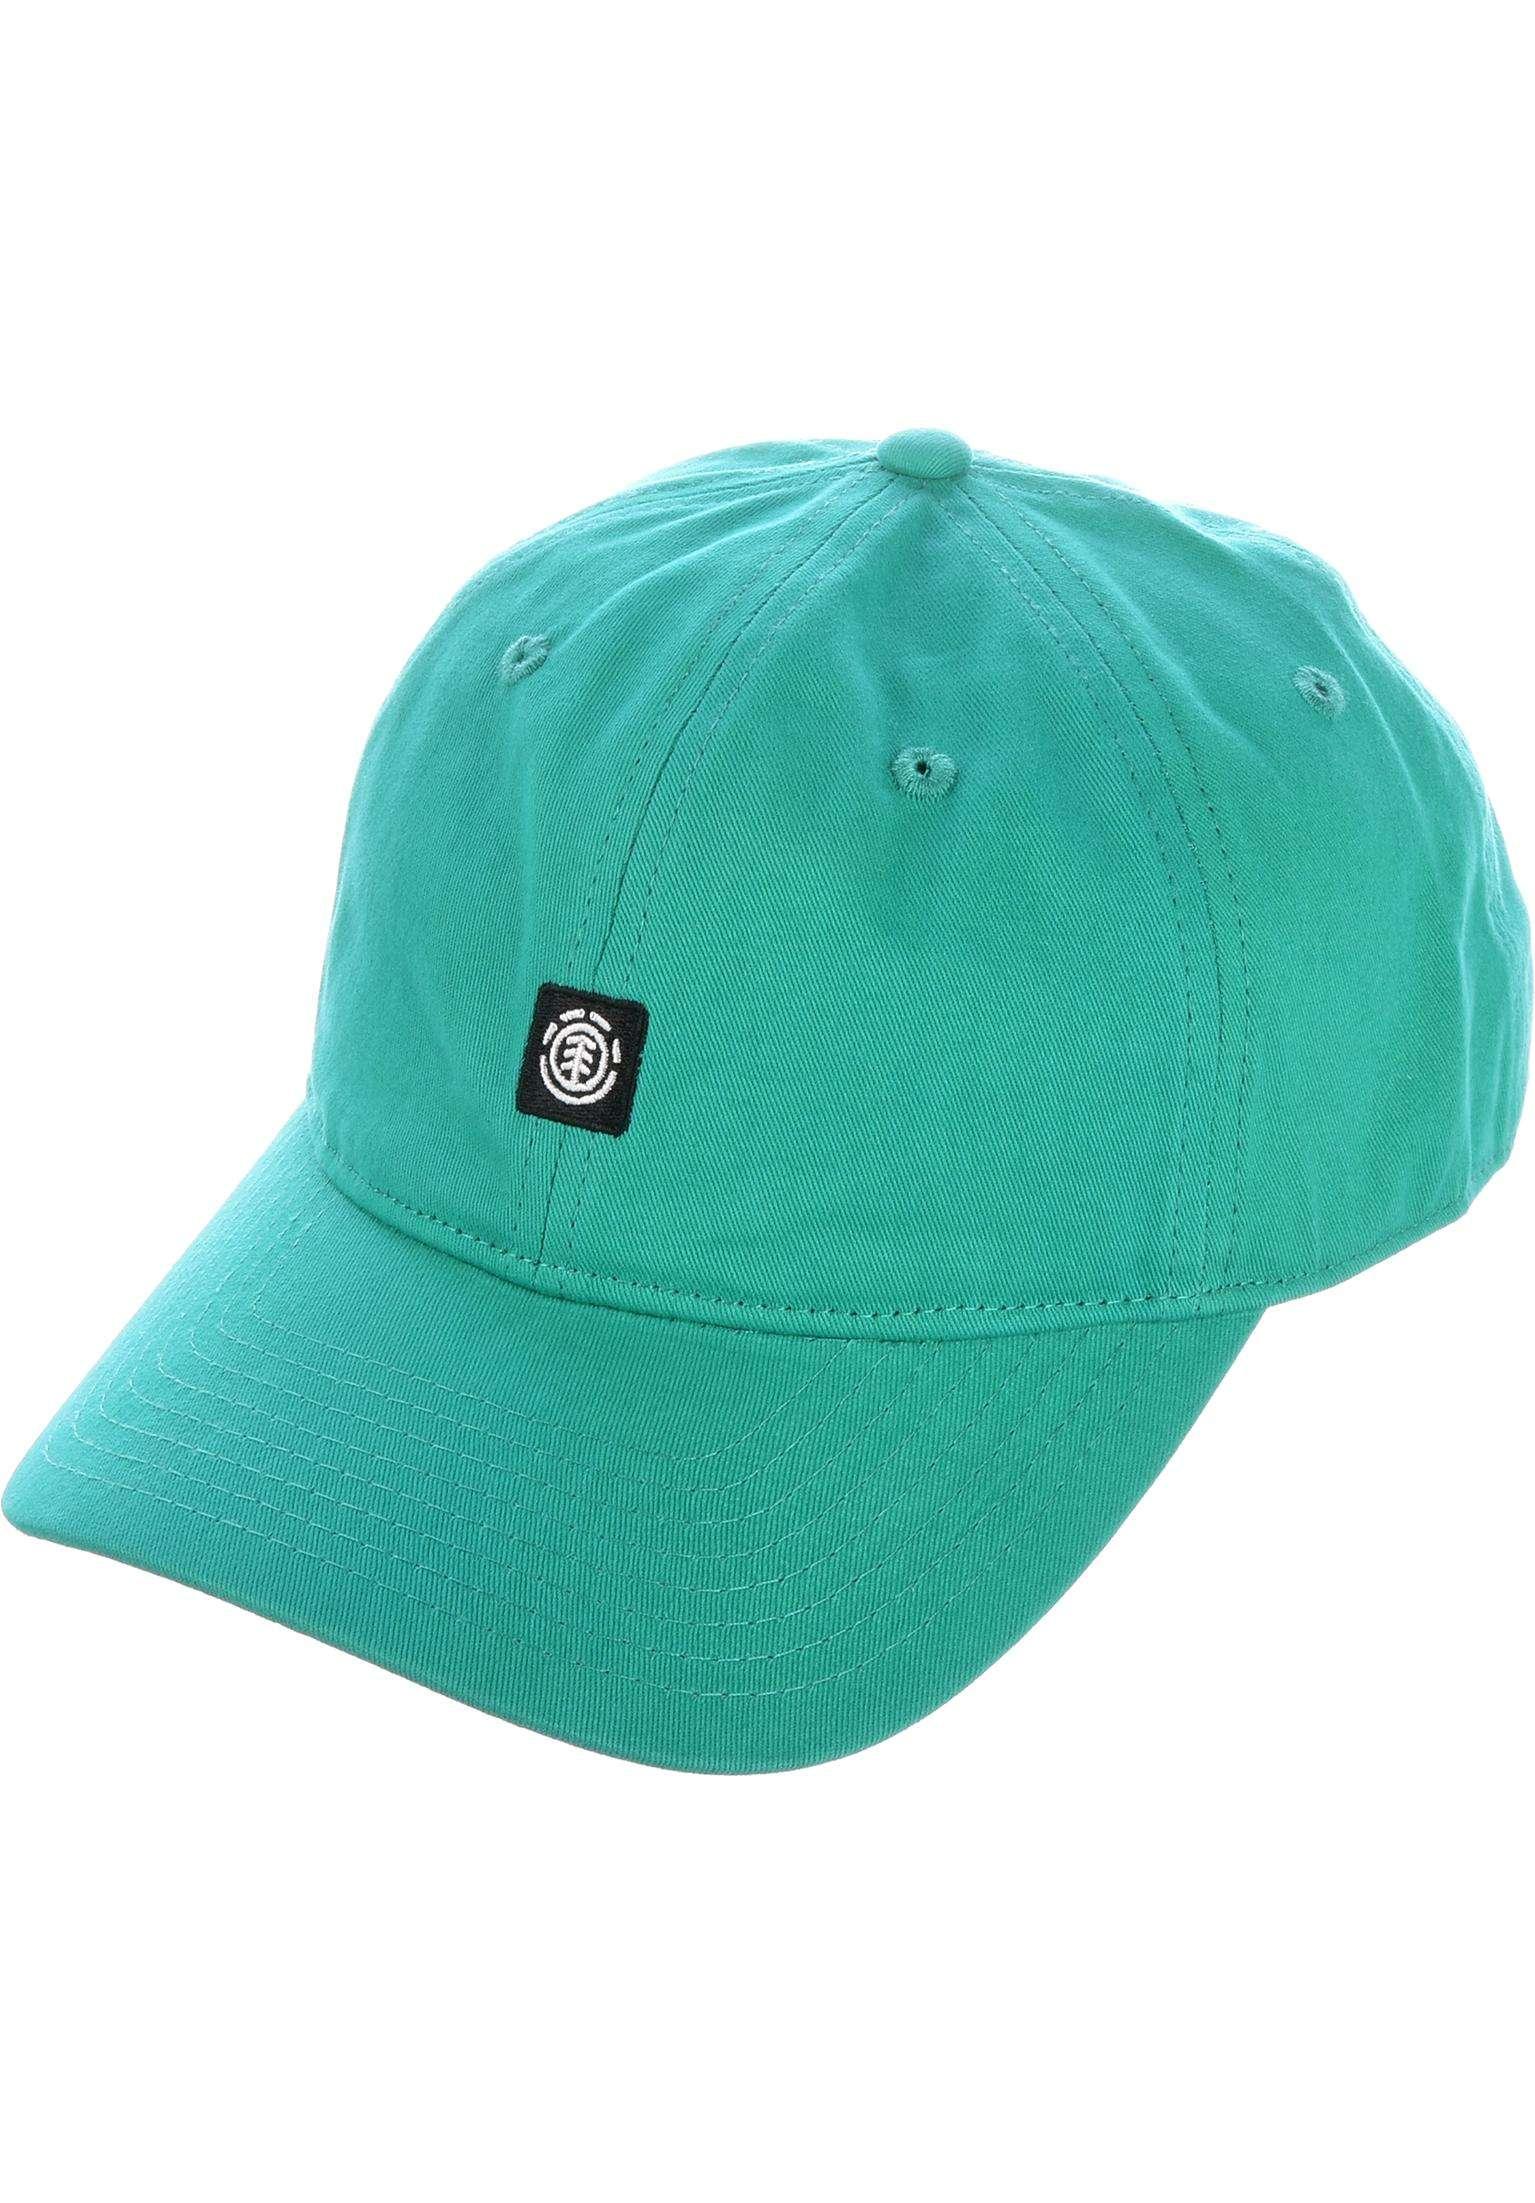 2bd098d9161 Fluky Dad Hat Cap Element Caps in dynastygreen for Men